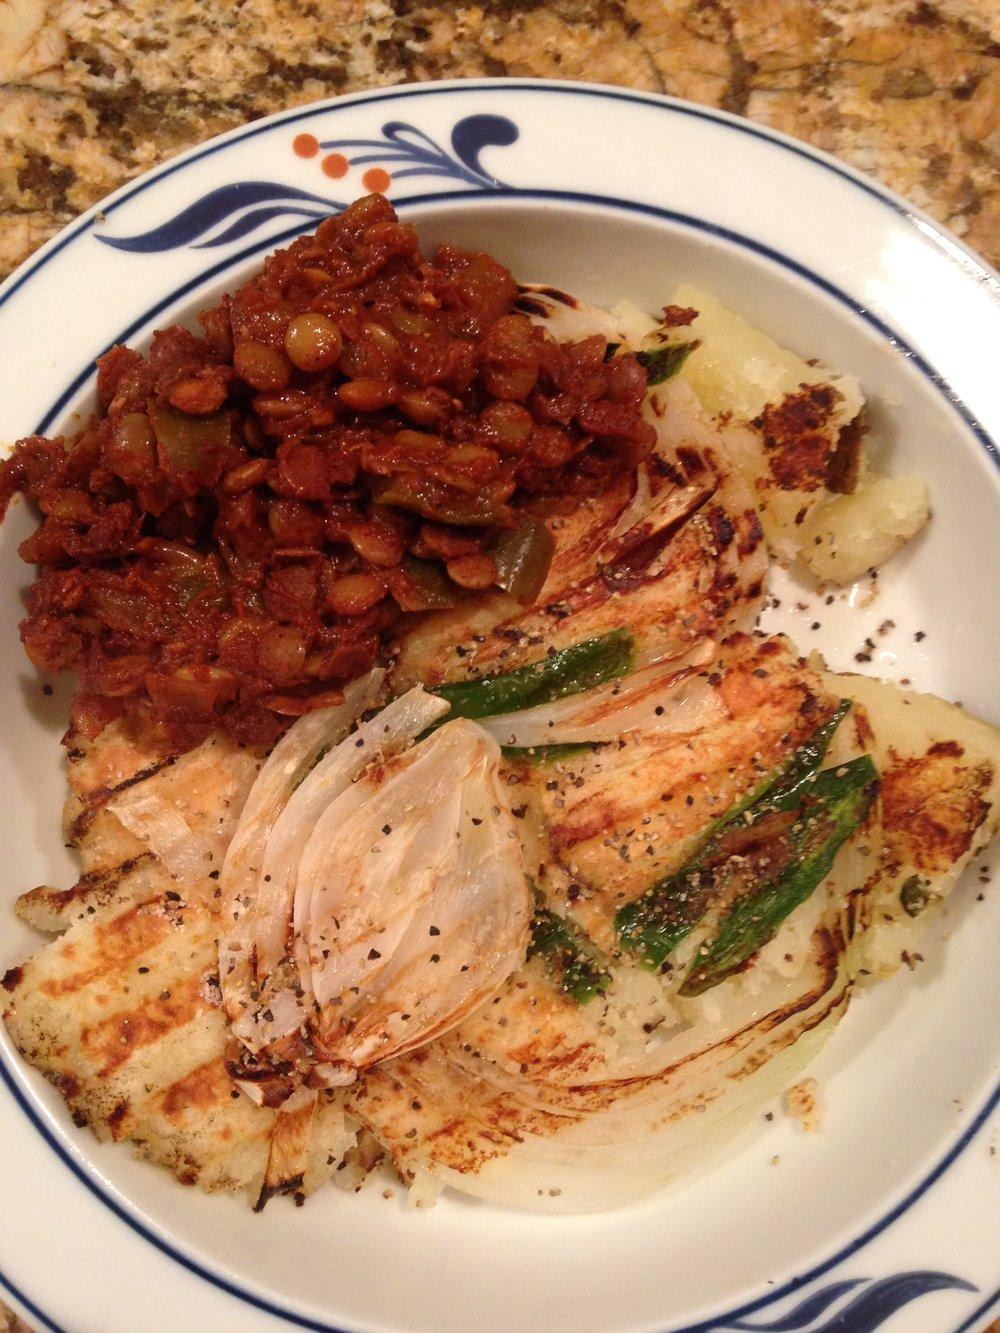 Smashed potatoes, onions, jalapeno in Panini maker, along side of sloppy lentils!